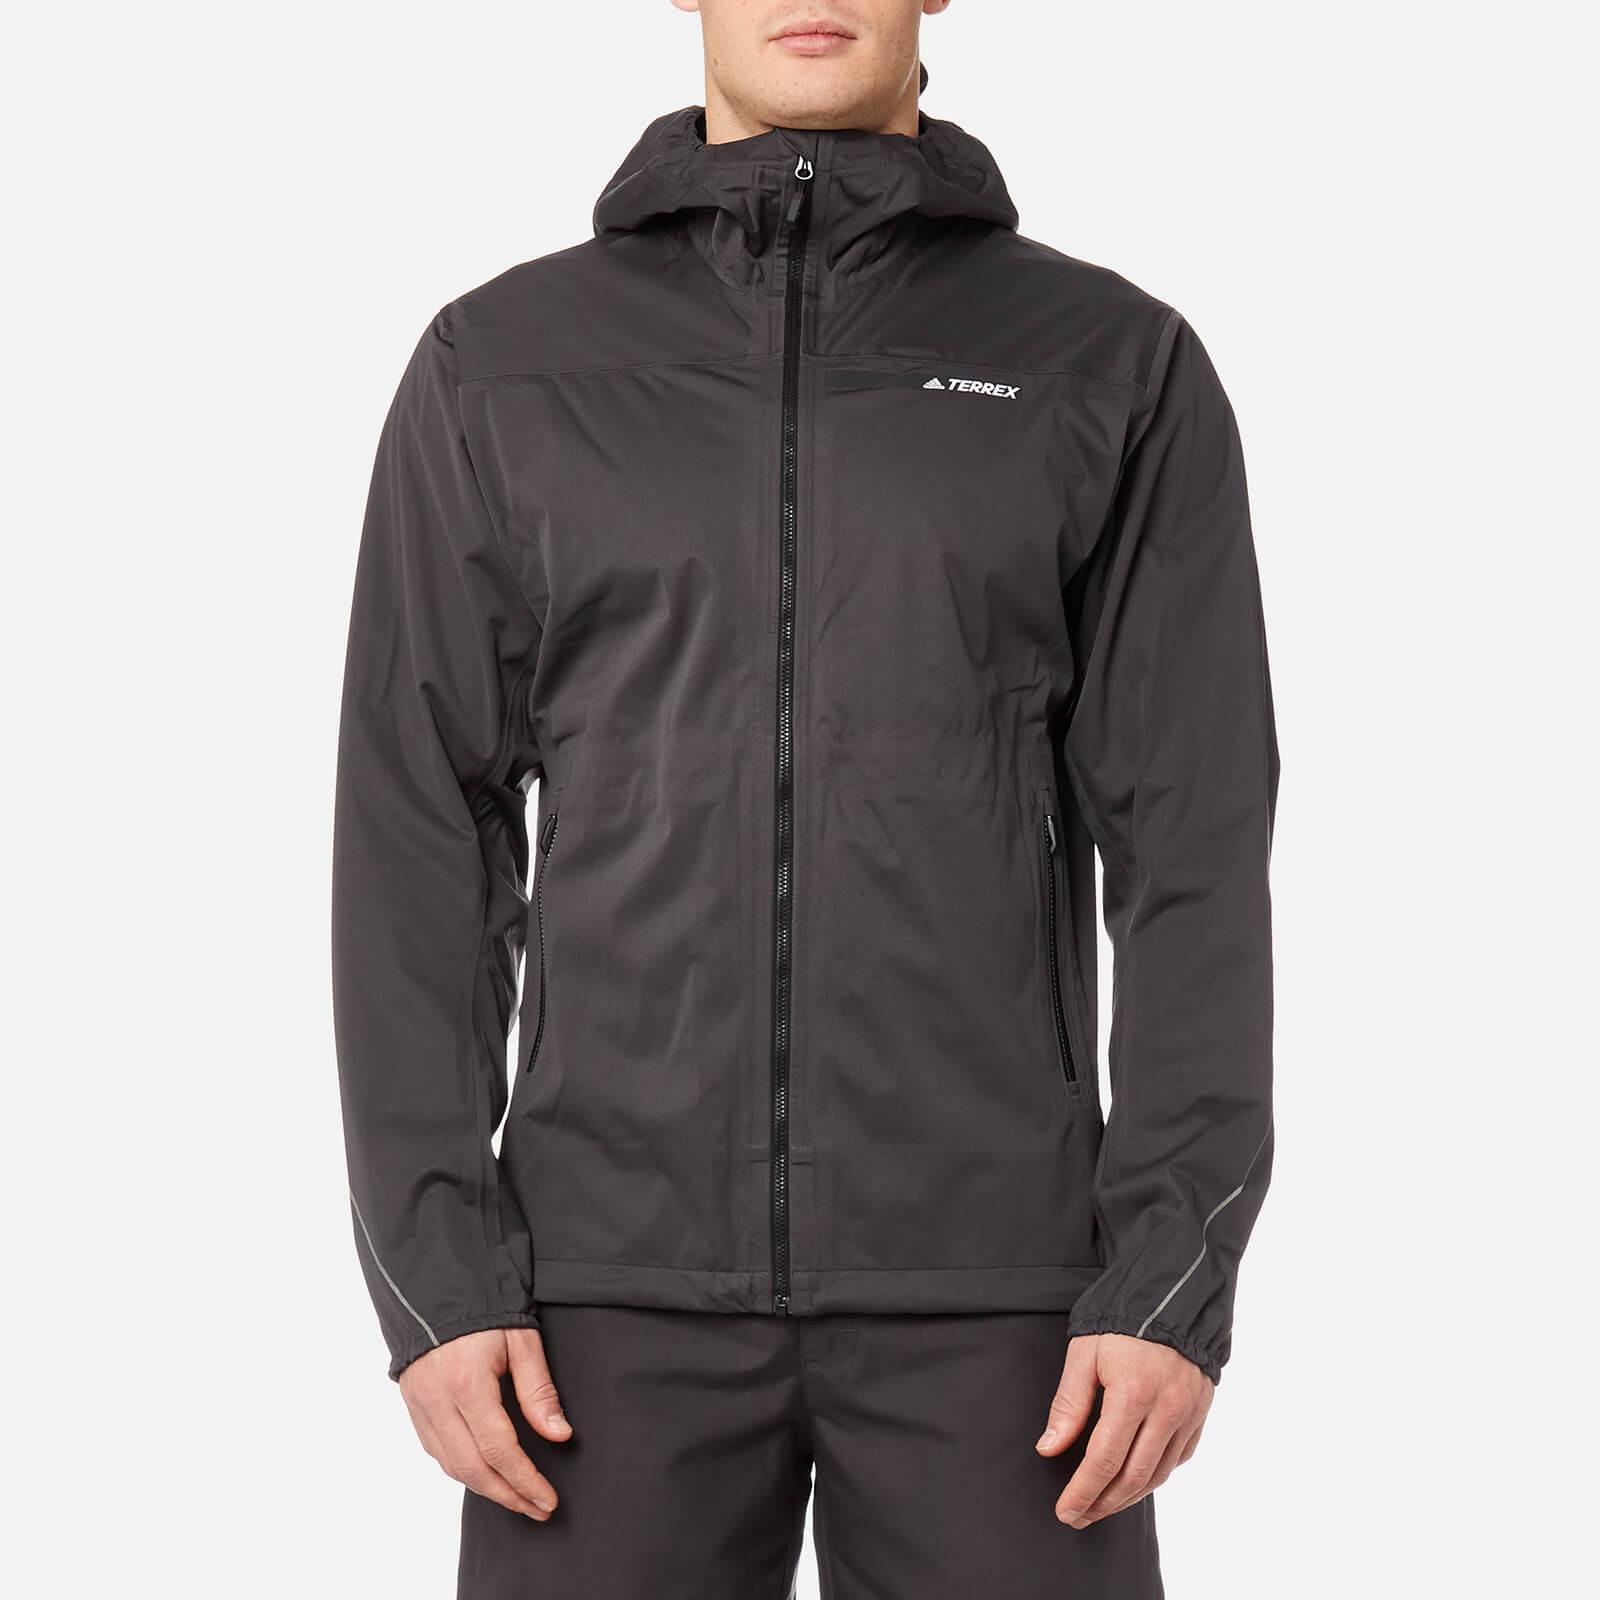 incredible prices better cheap price adidas Terrex Men's Multi 3-Layer GTX Jacket - Black